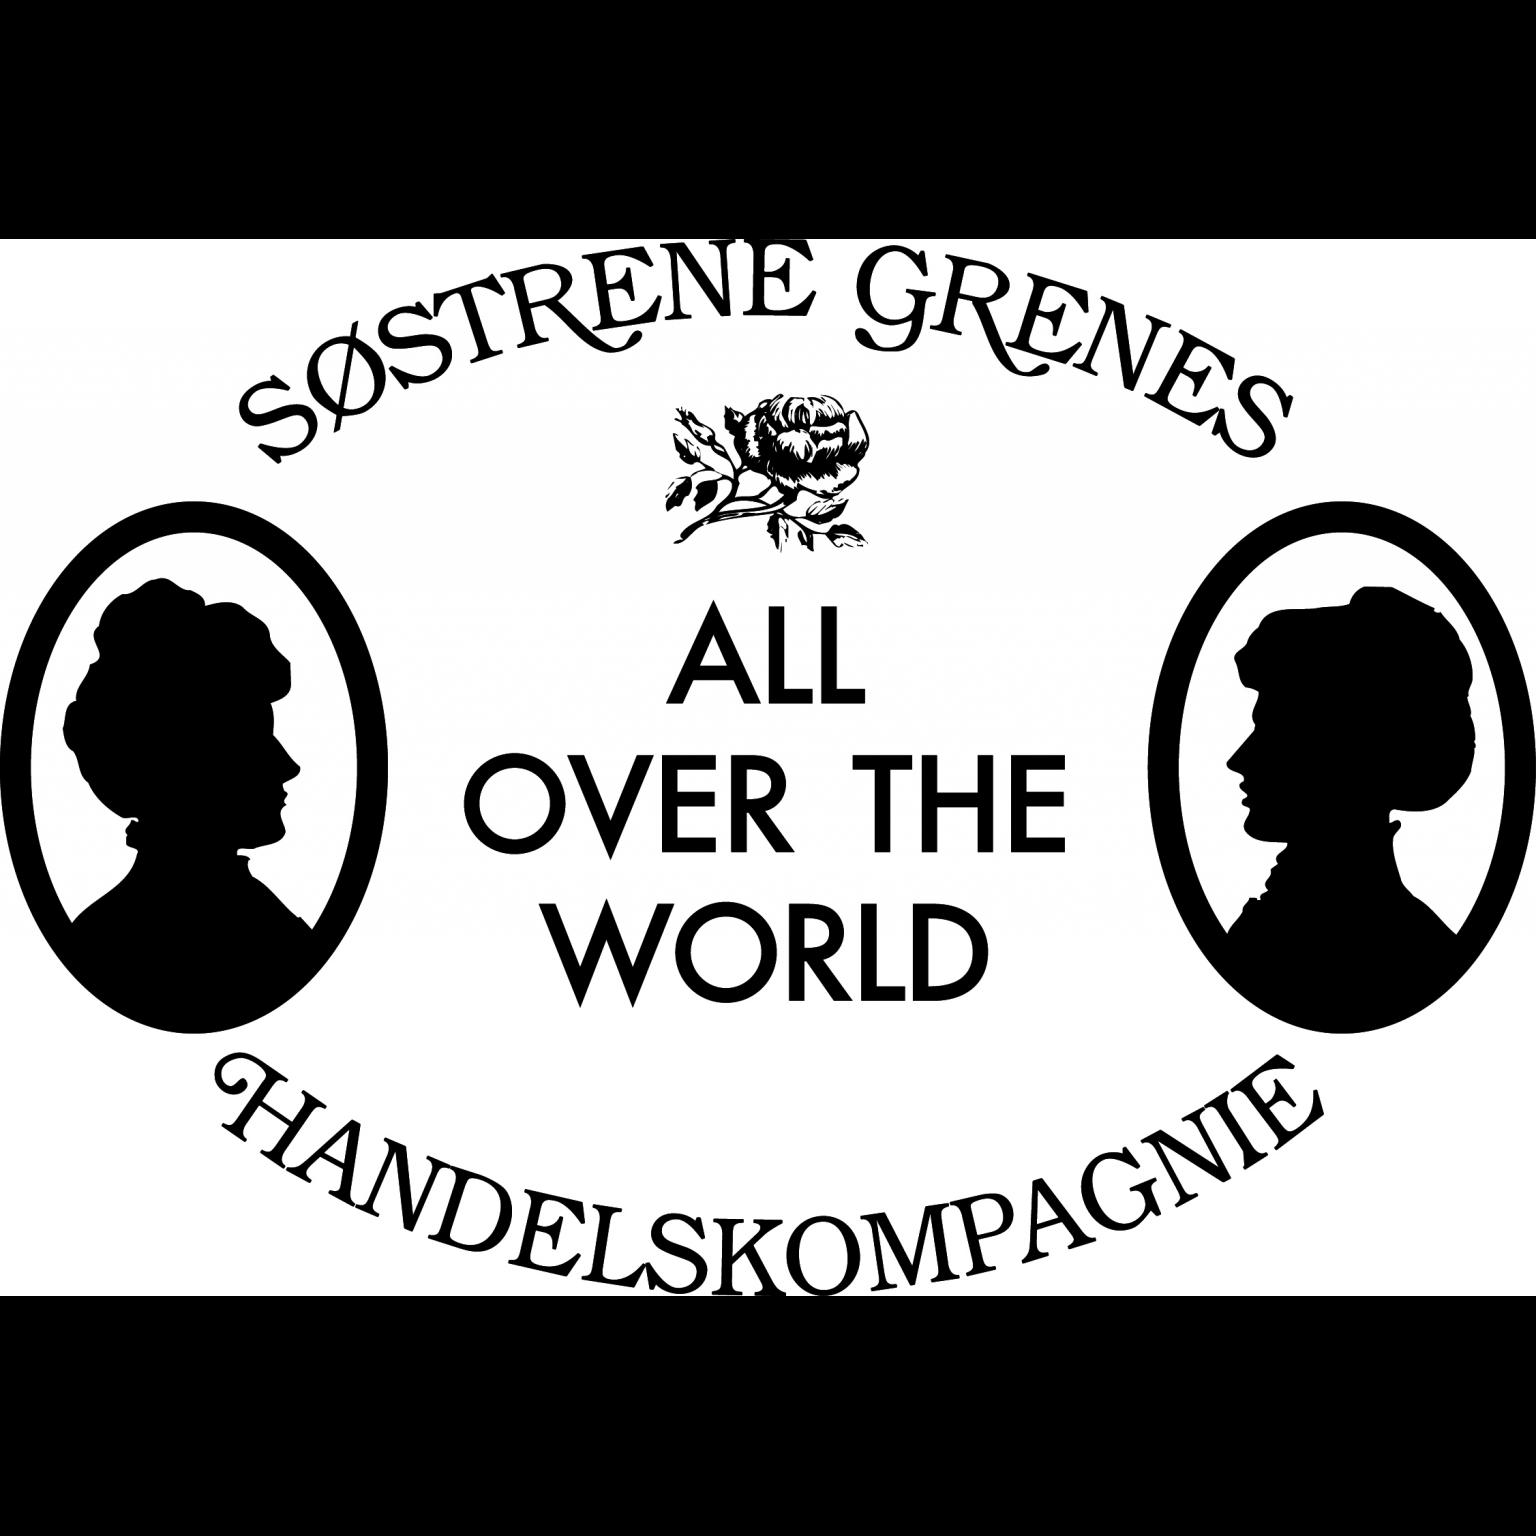 sostrene_greneのRoomClip公式アカウント